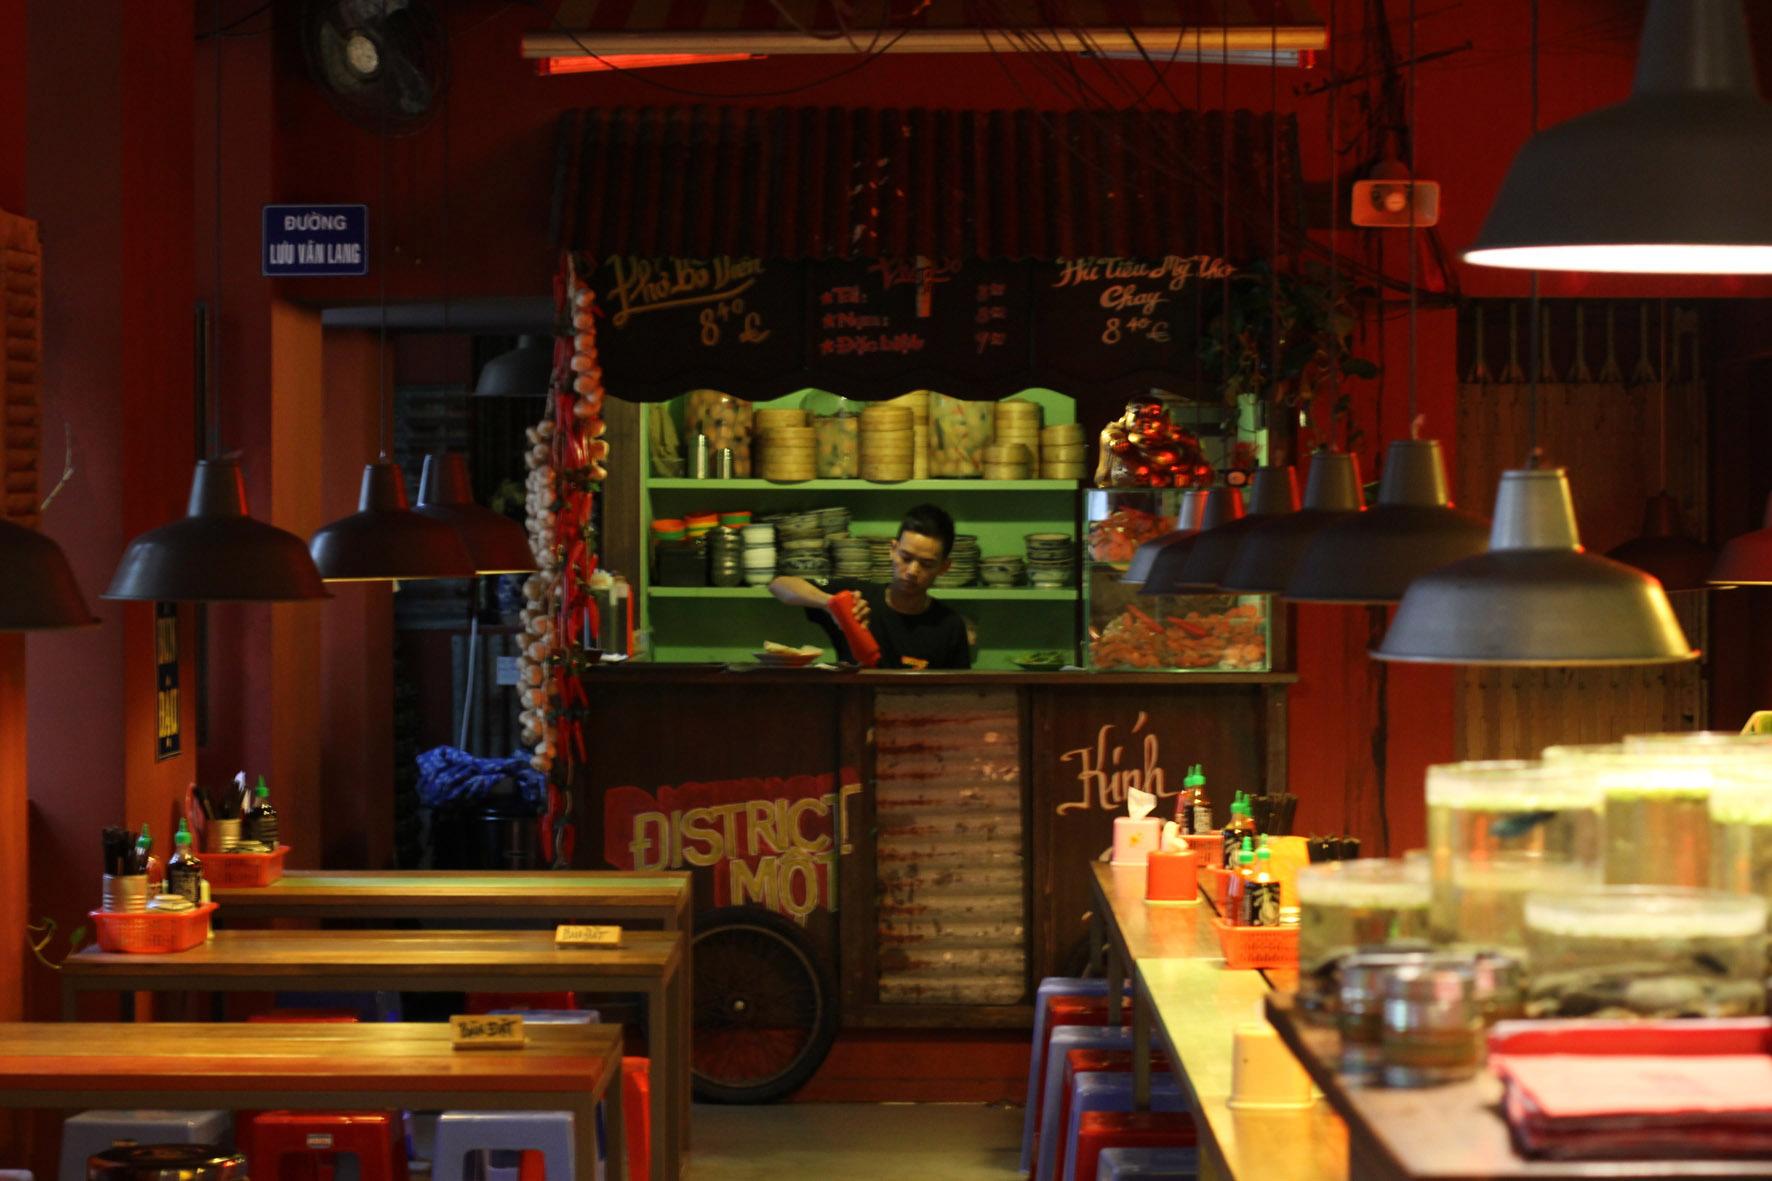 district mot saigon street food in berlin berlin love. Black Bedroom Furniture Sets. Home Design Ideas